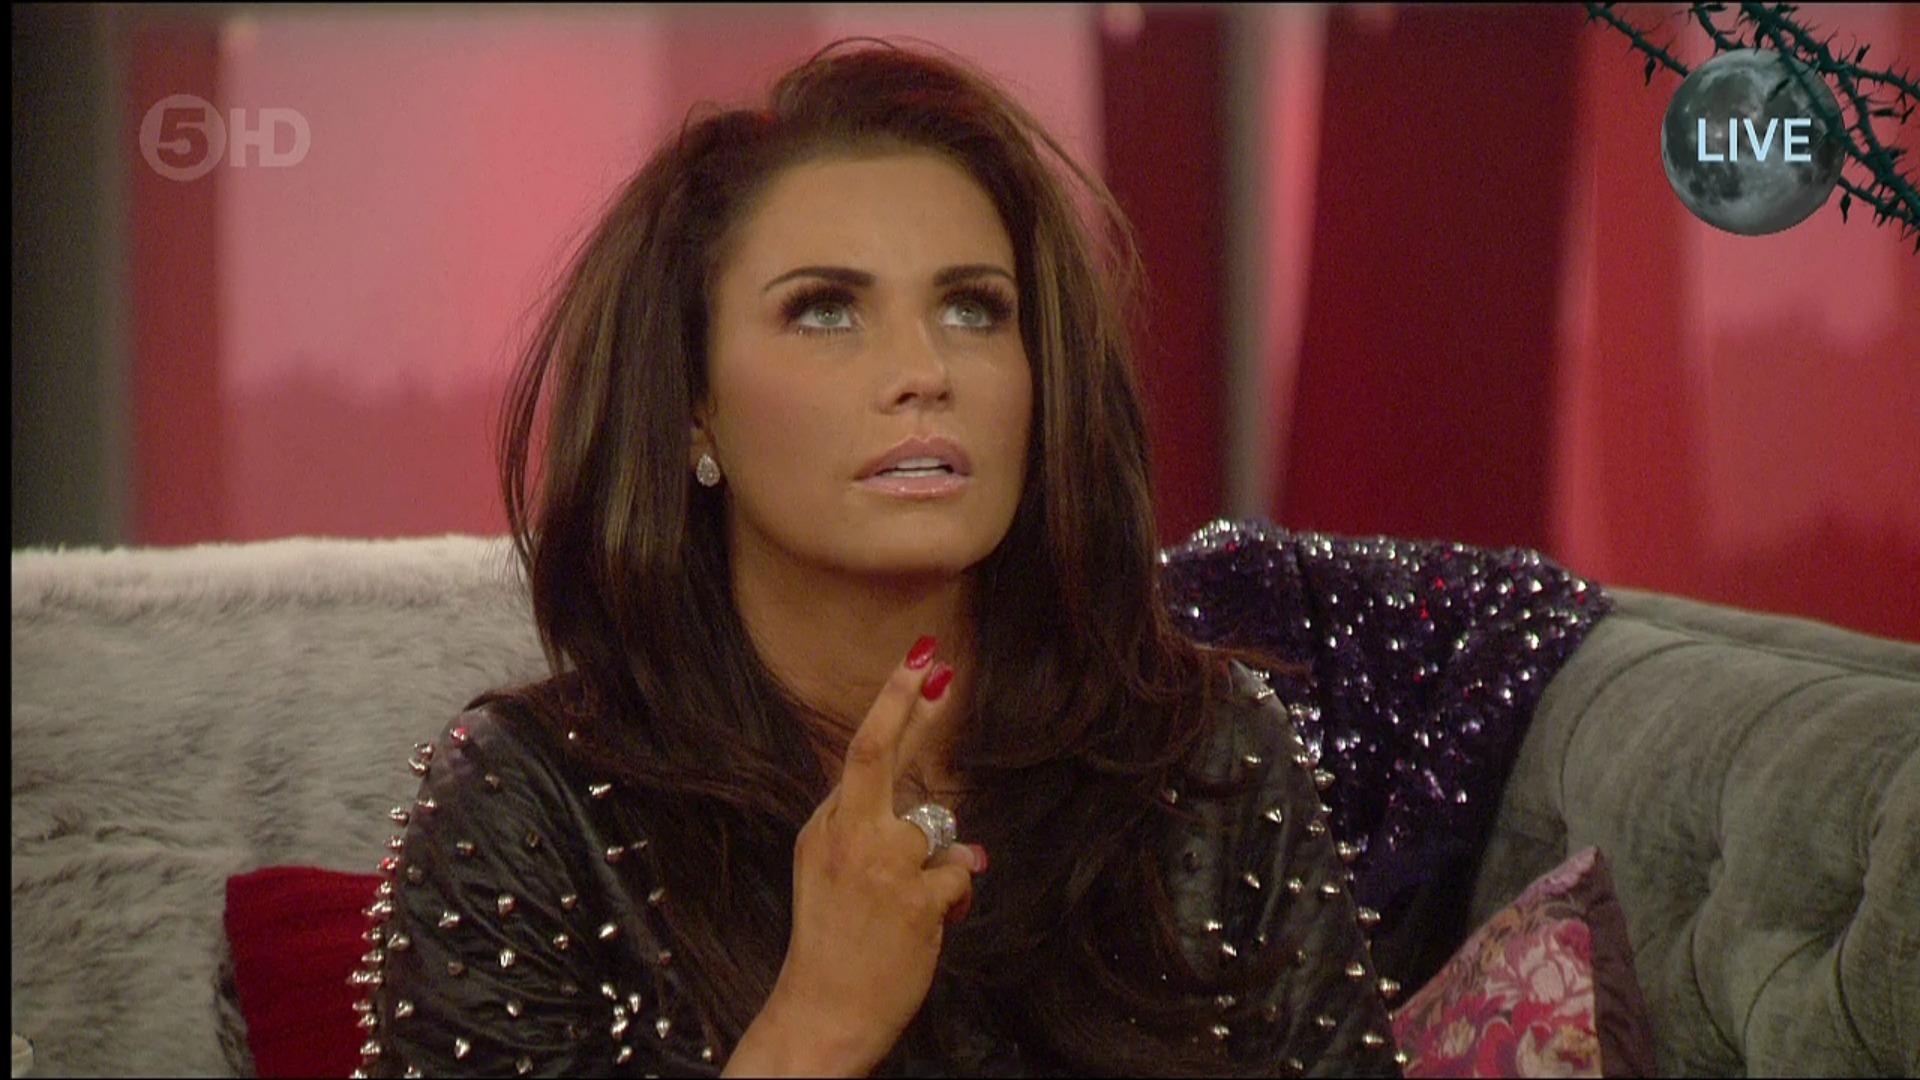 Will Katie Price win Celebrity Big Brother 2015?